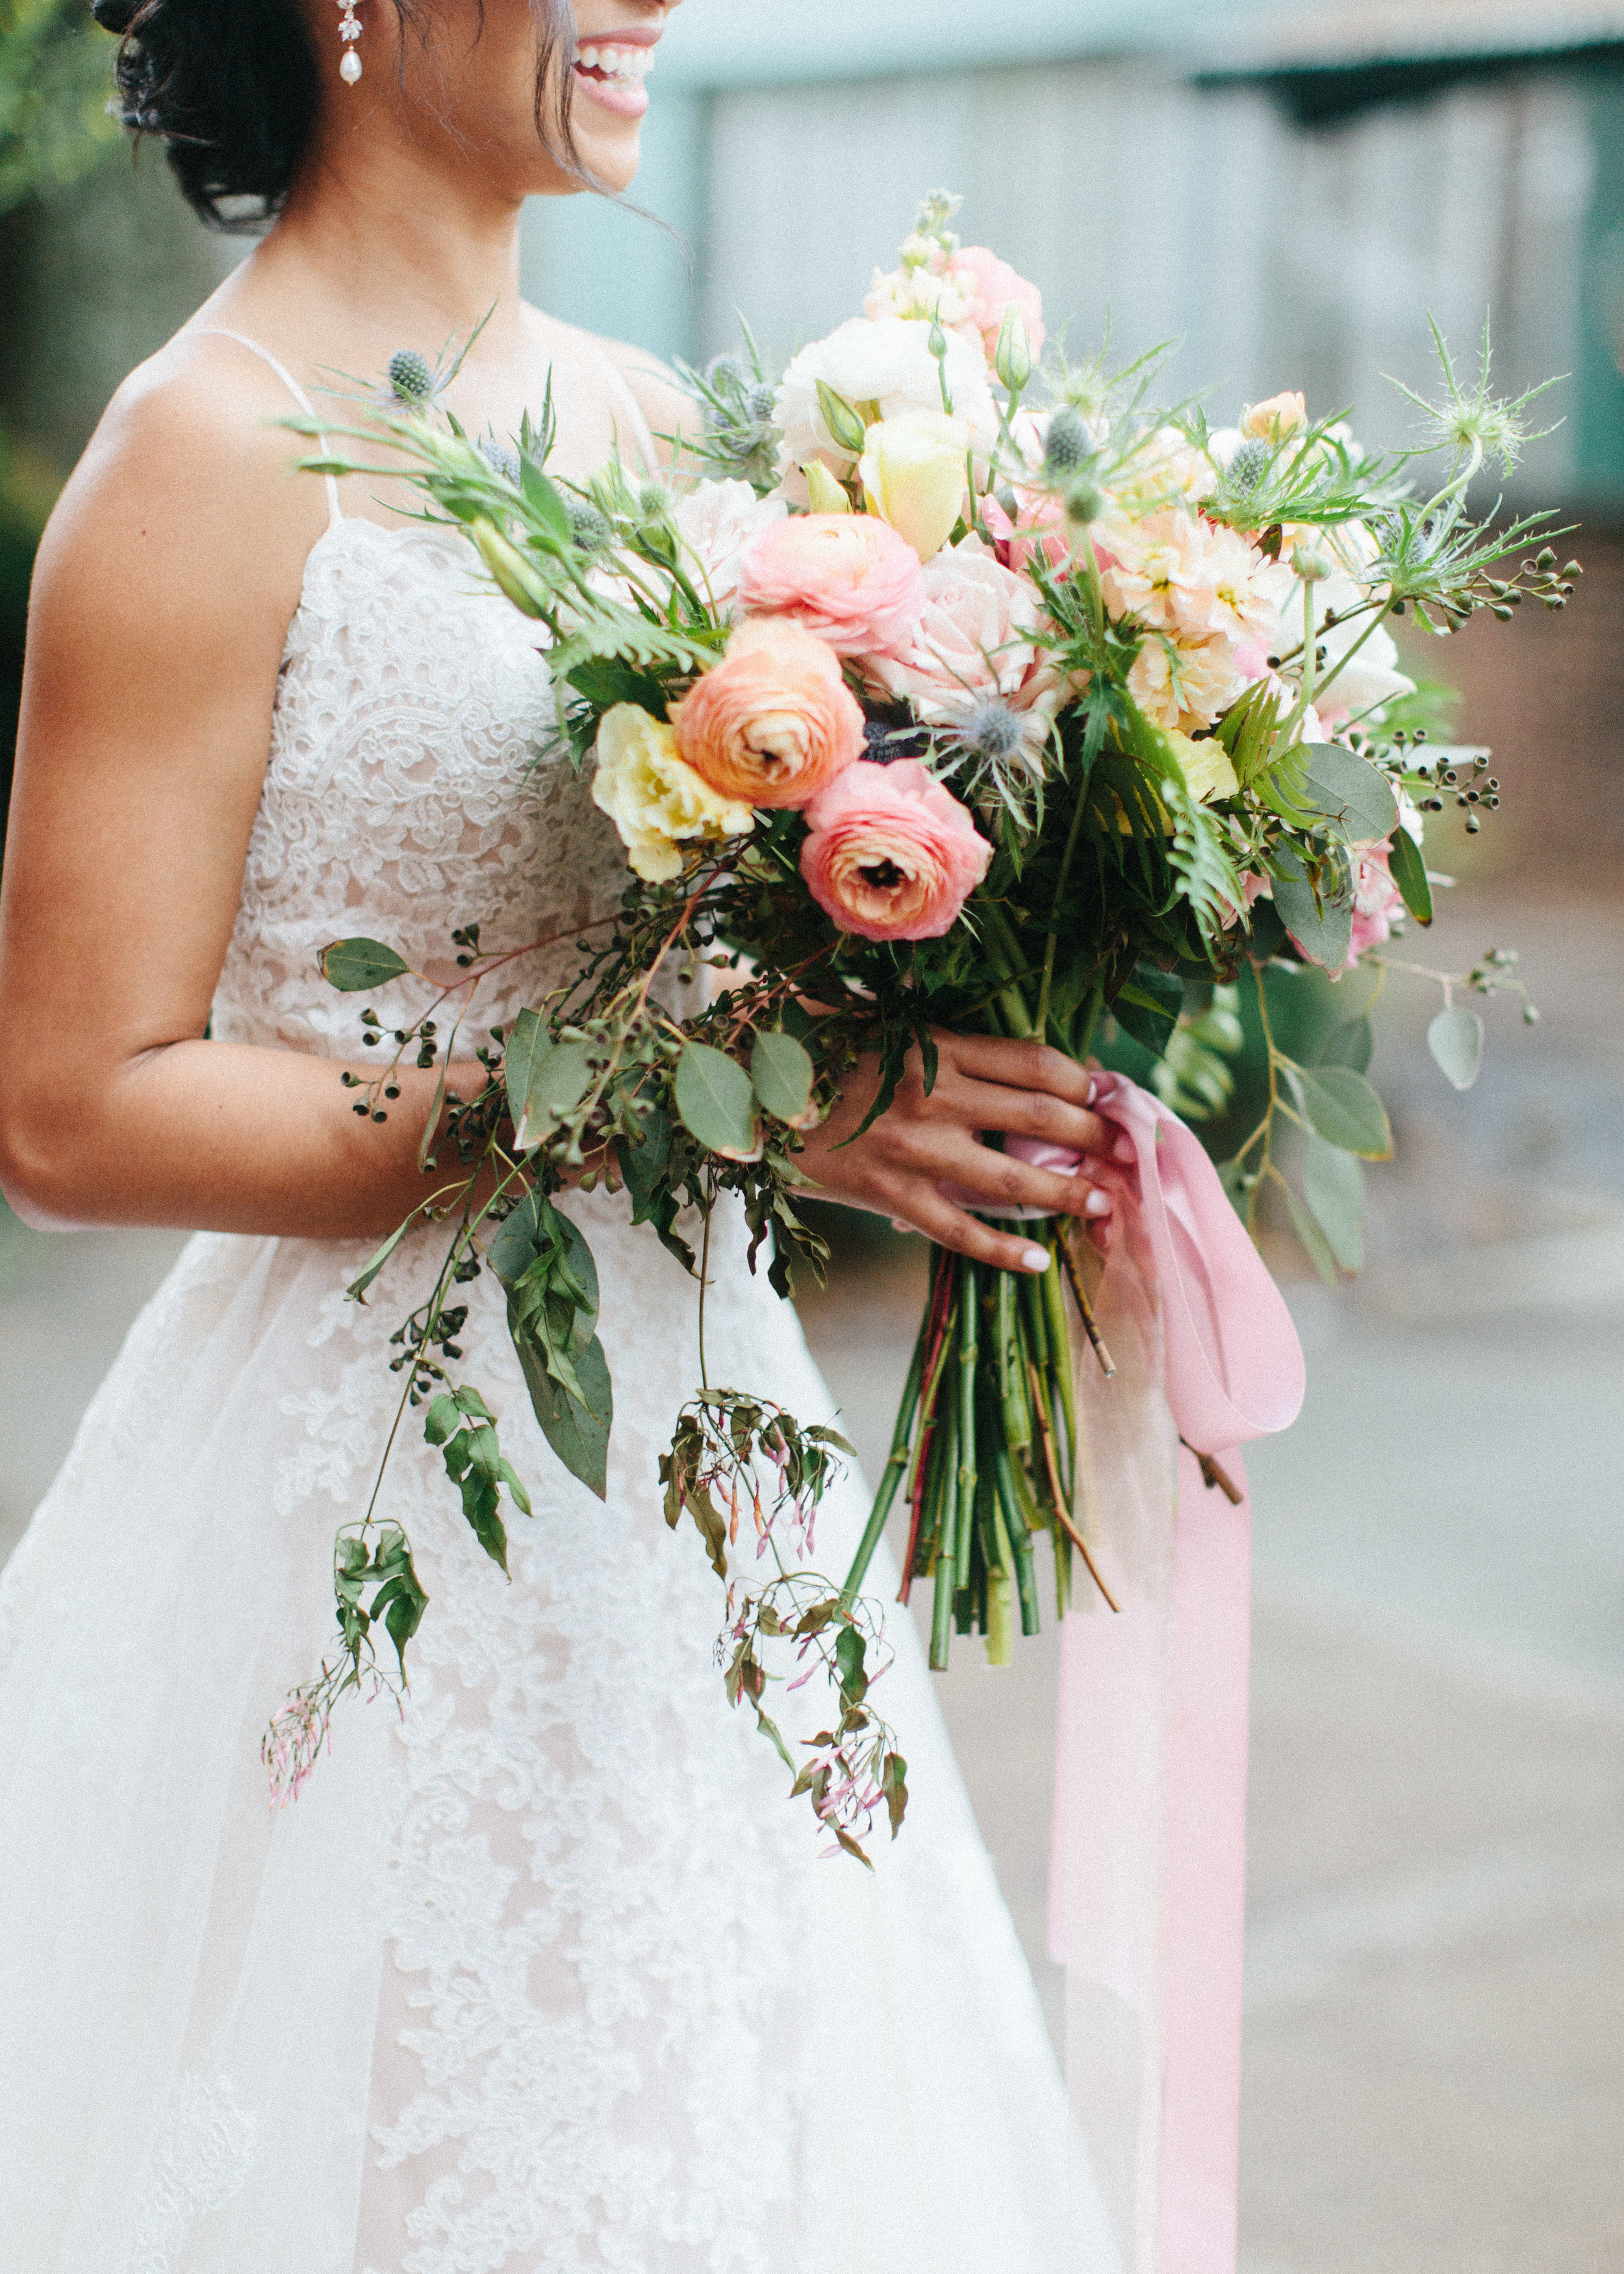 king_plow_atlanta_wedding_art_gallery_modern_lifestyle_documentary_1184.jpg